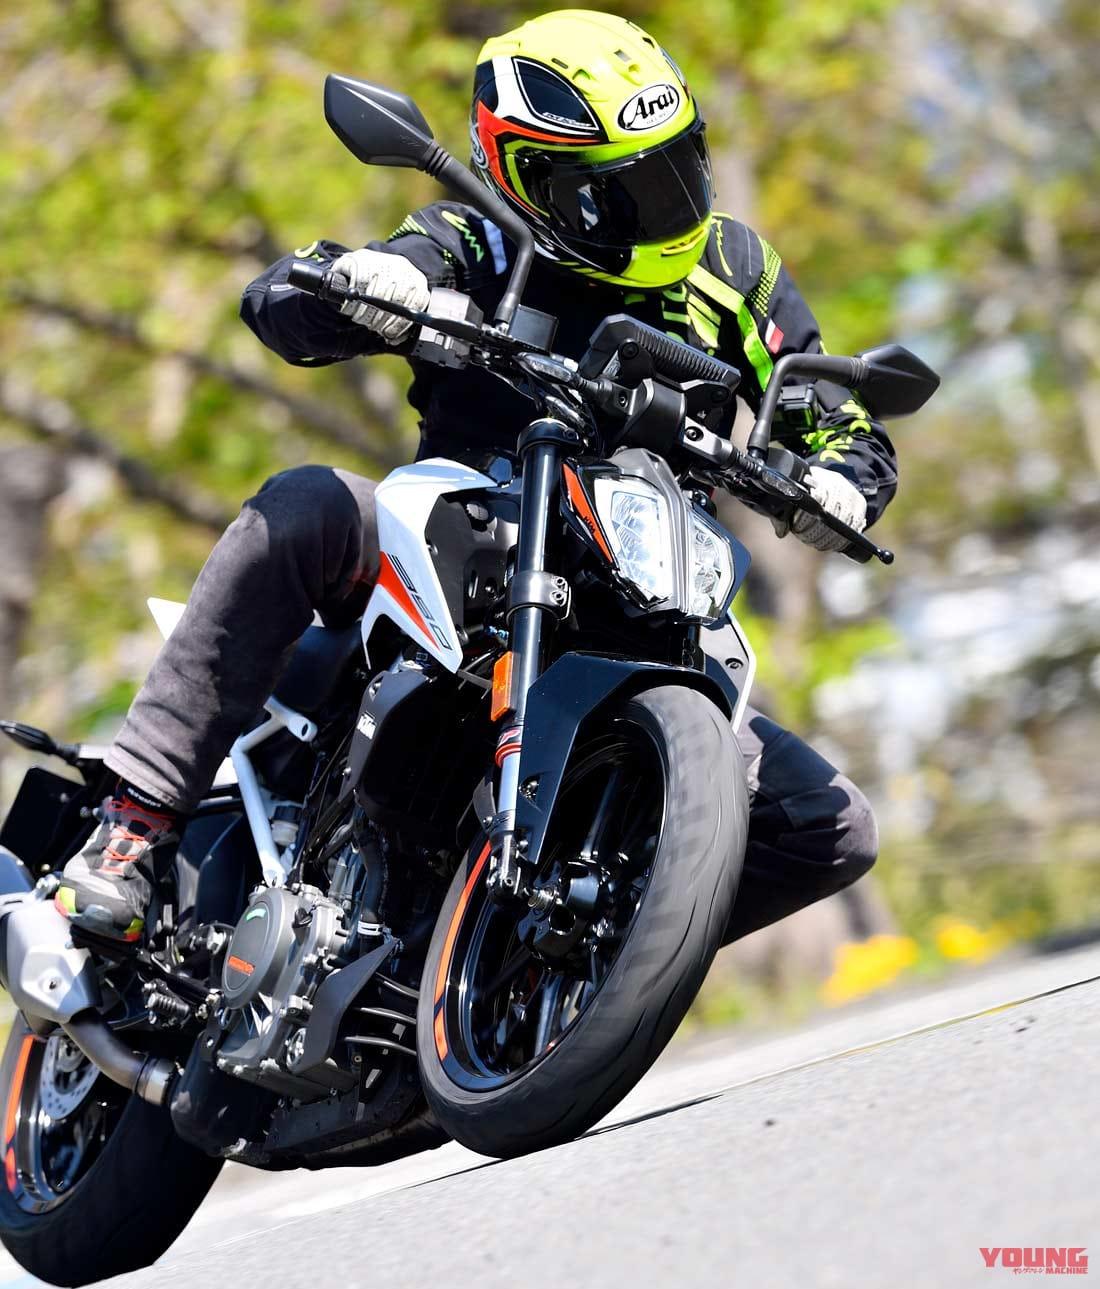 '21 KTM 390デューク試乗ショートインプレ 【クイックシフターがオプションで追加可能に】